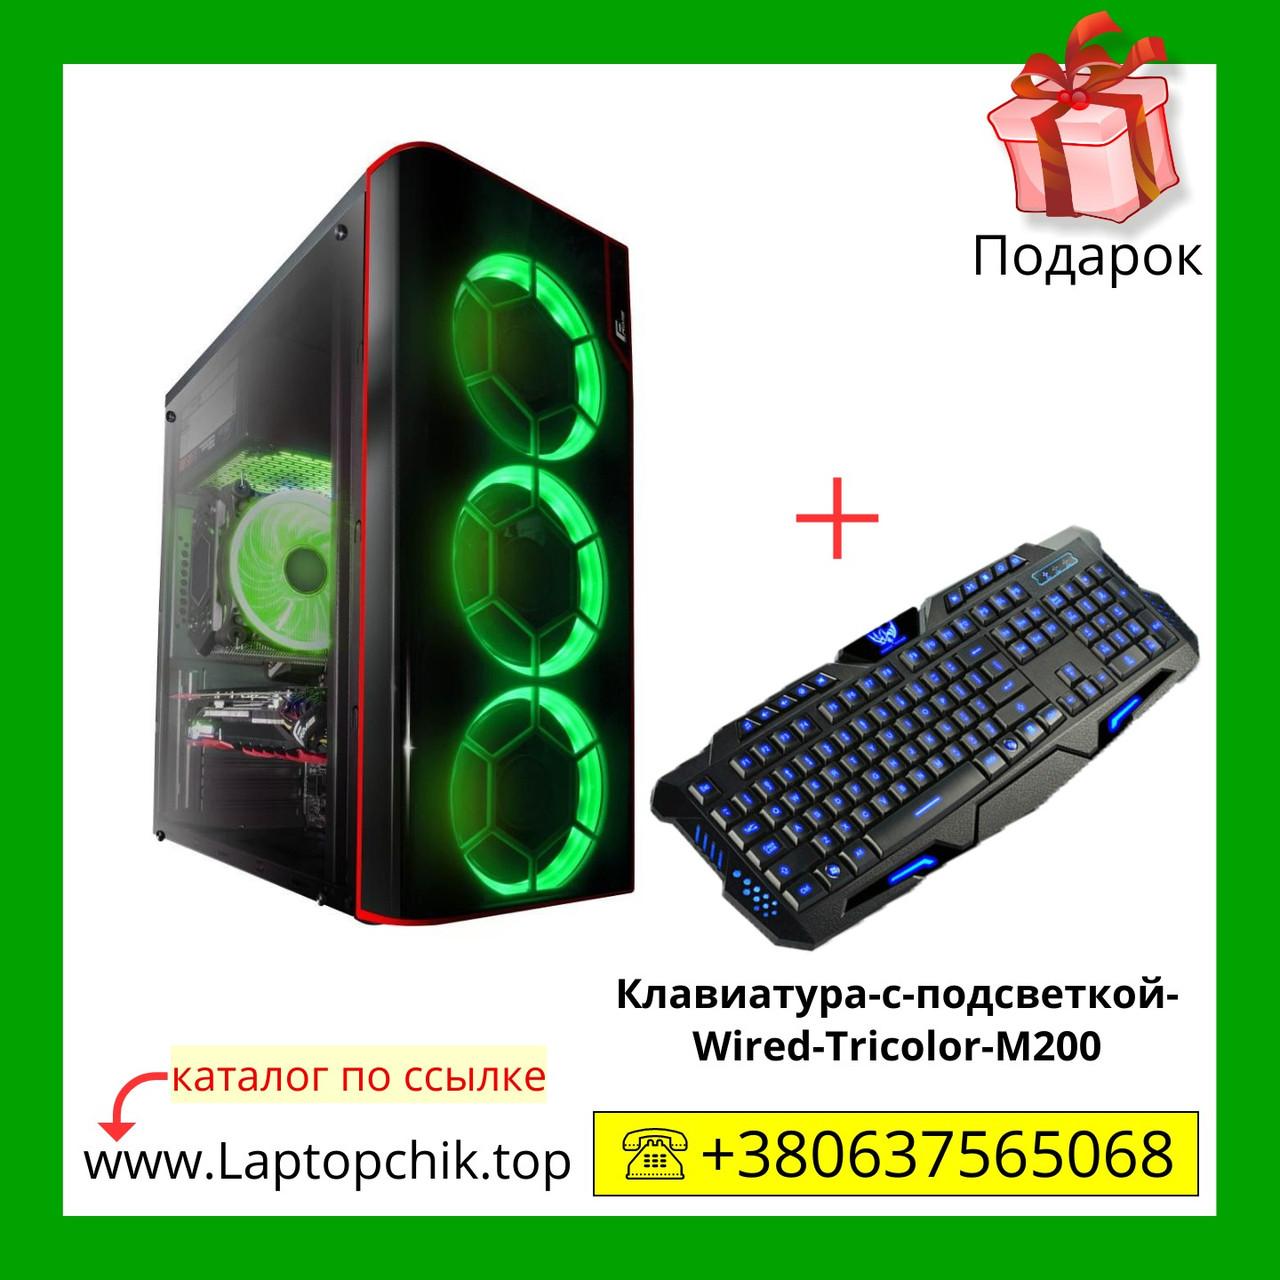 Игровой компьютер Intel Core i7-3770 / 8 RAM / 1Tb HDD / GeForce GTX 1060 6GB